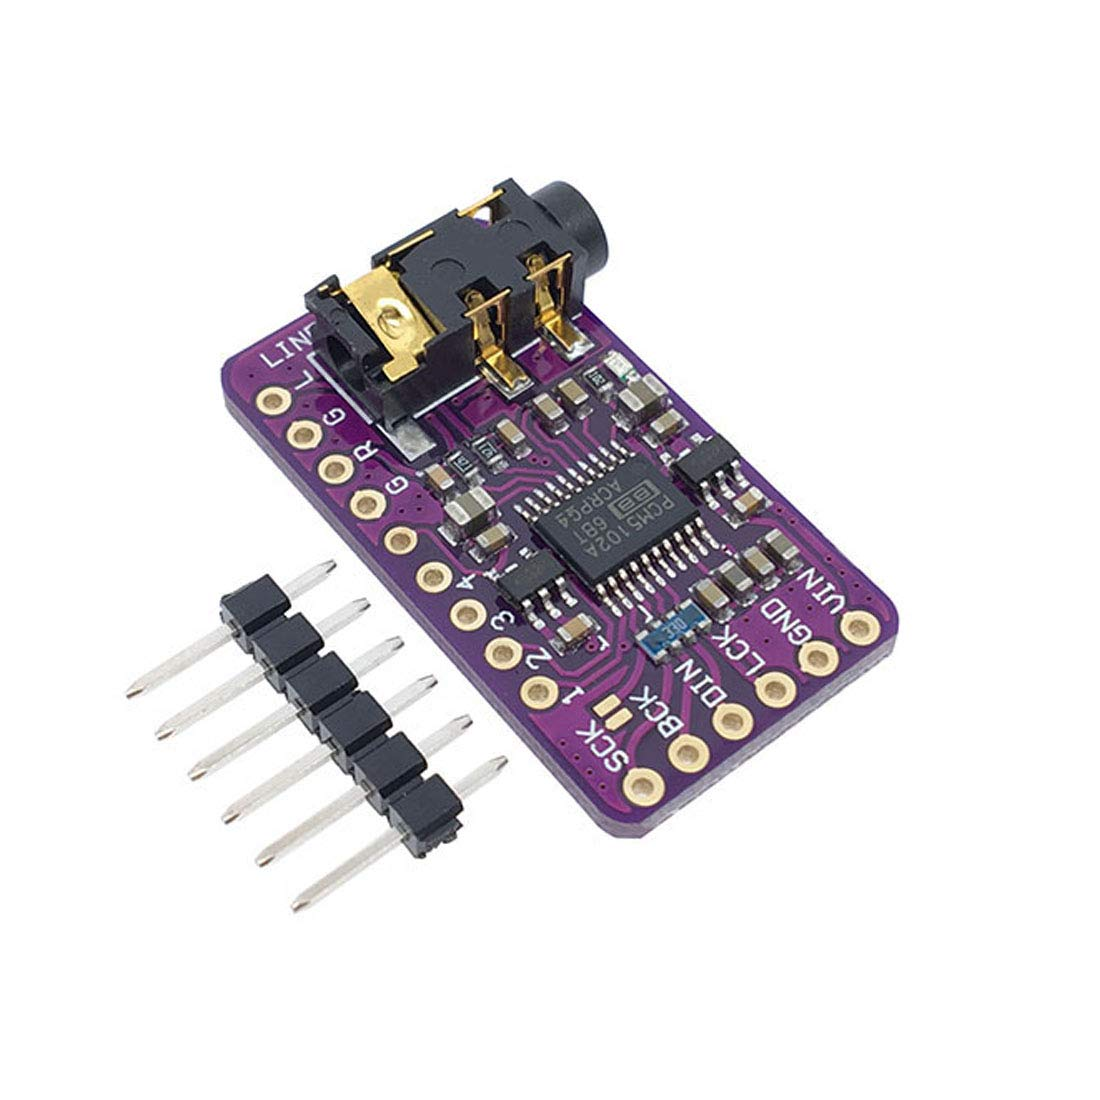 HiLetgo PCM5102 I2S IIS Lossless Digital Audio DAC Decoder Module Stereo DAC Digital-to-Analog Converter Voice Module for Arduino Raspberry Pi